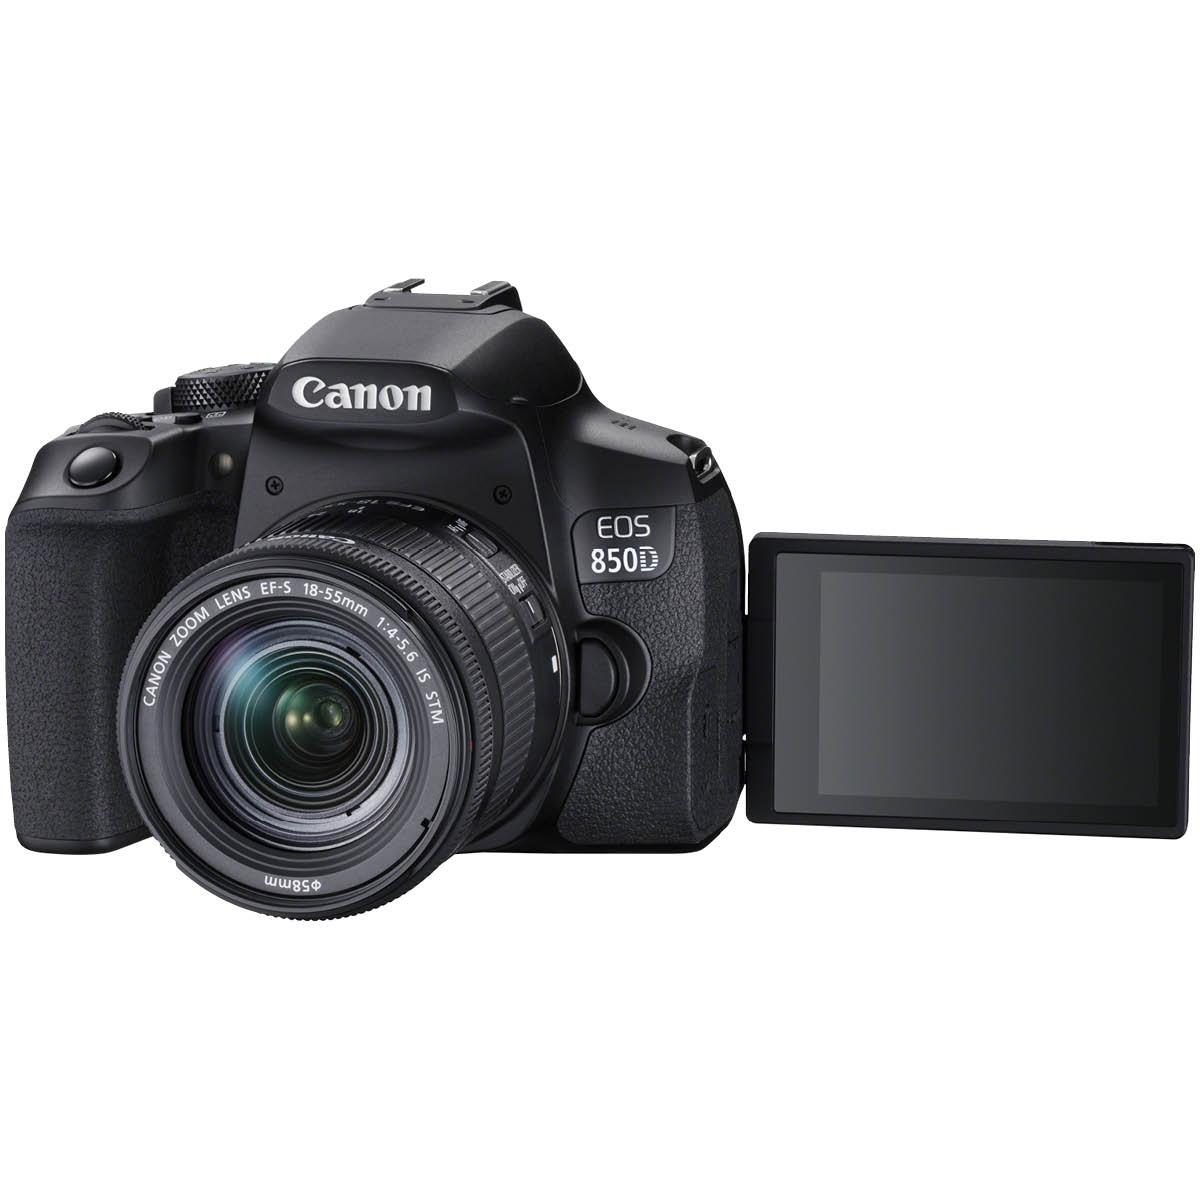 Canon EOS 850D Kit mit 18-55 mm 1:3,5-5,6